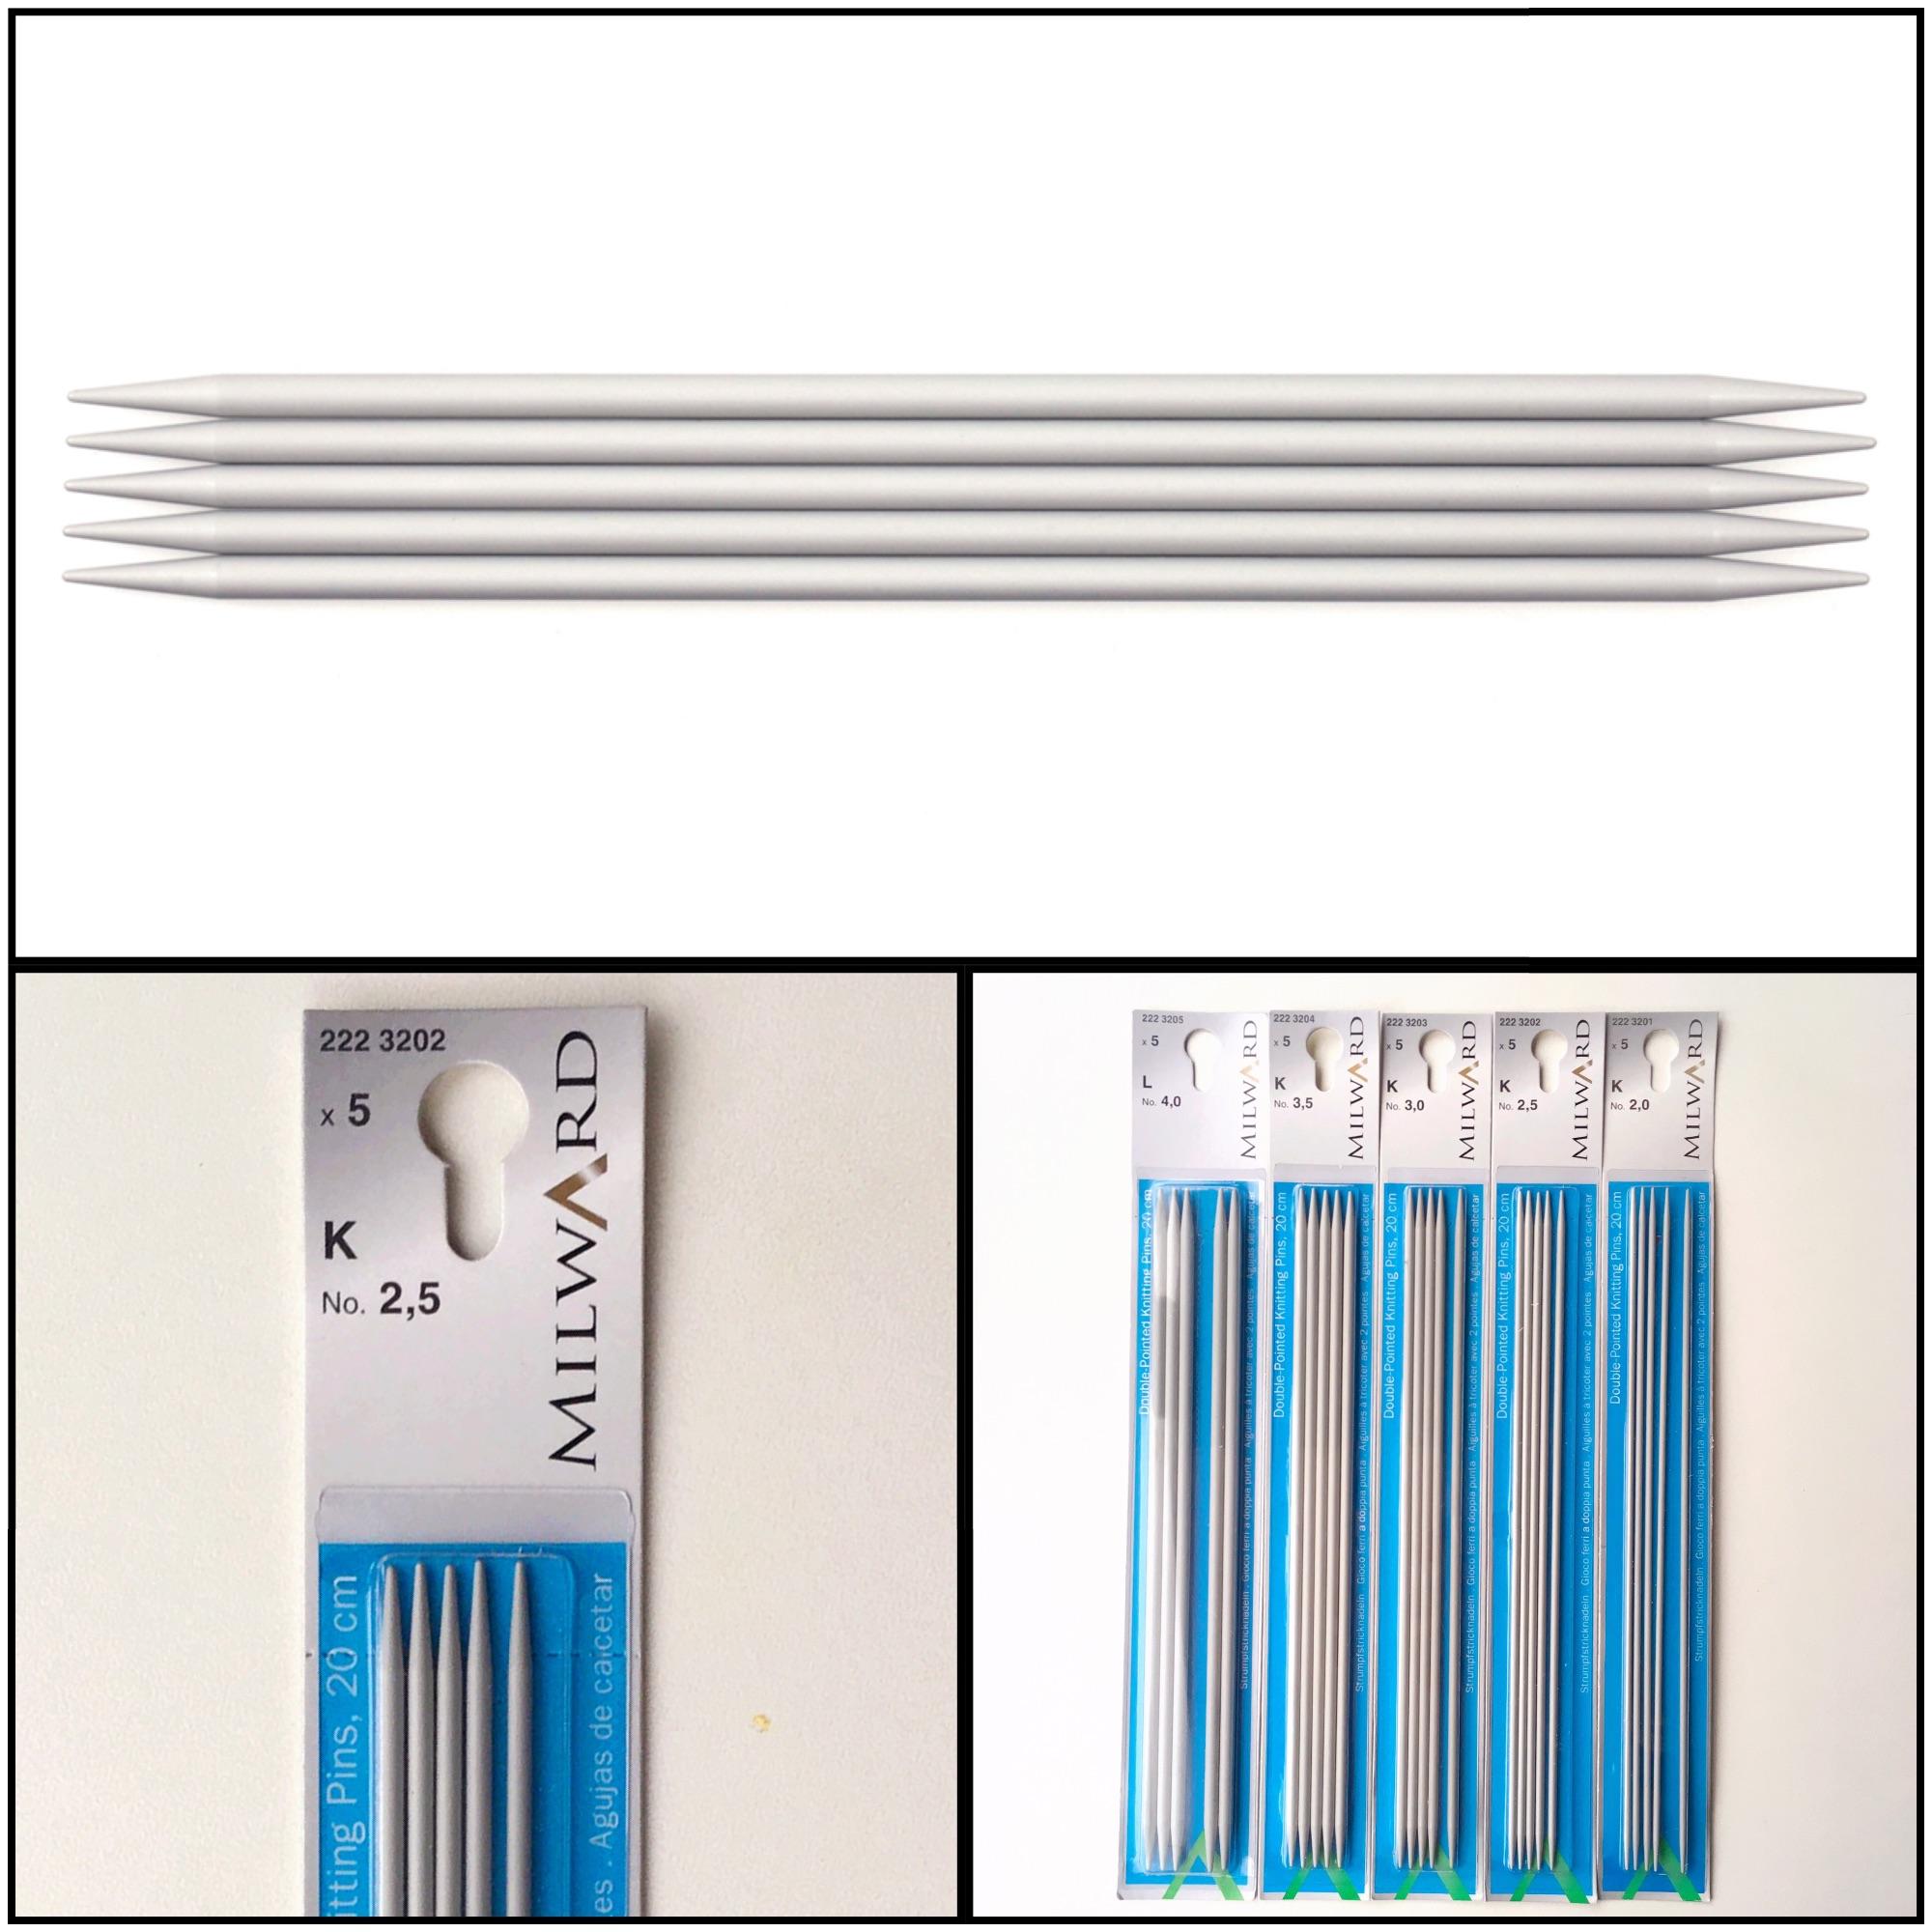 Milward 20cm double end aluminium knitting needles set of 5 in 3 pics